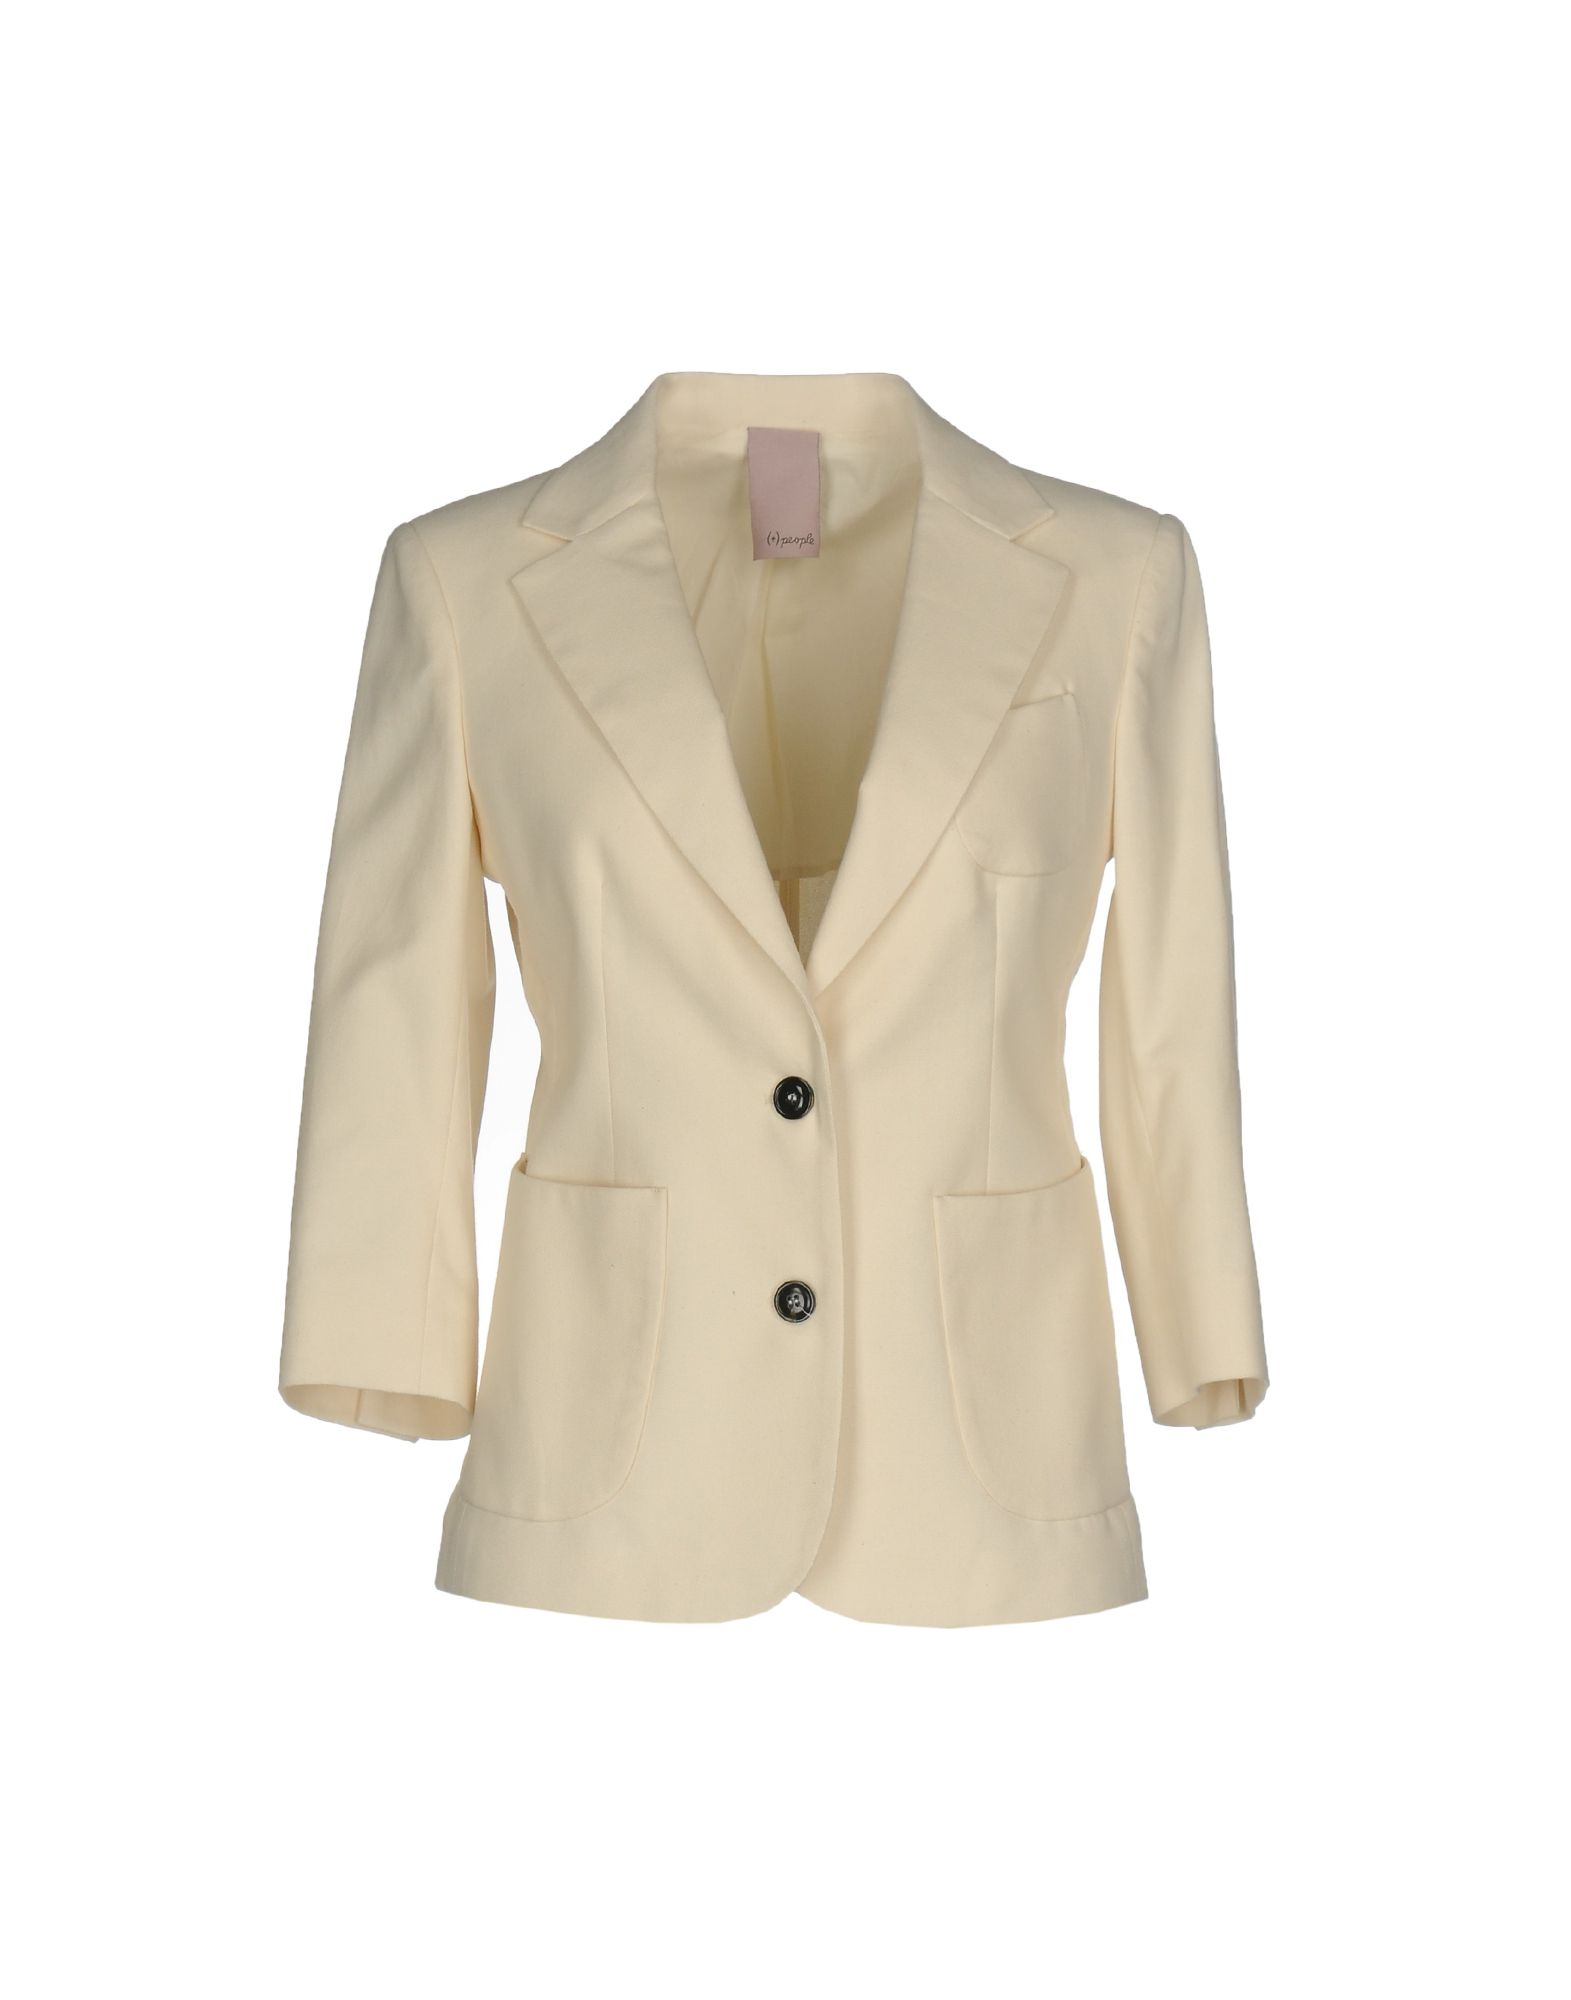 c9b213ce53b Κορυφαία προϊόντα για Γυναικεία Ρούχα - Ακριβότερα Προϊόντα - Σελίδα 3591 |  Outfit.gr